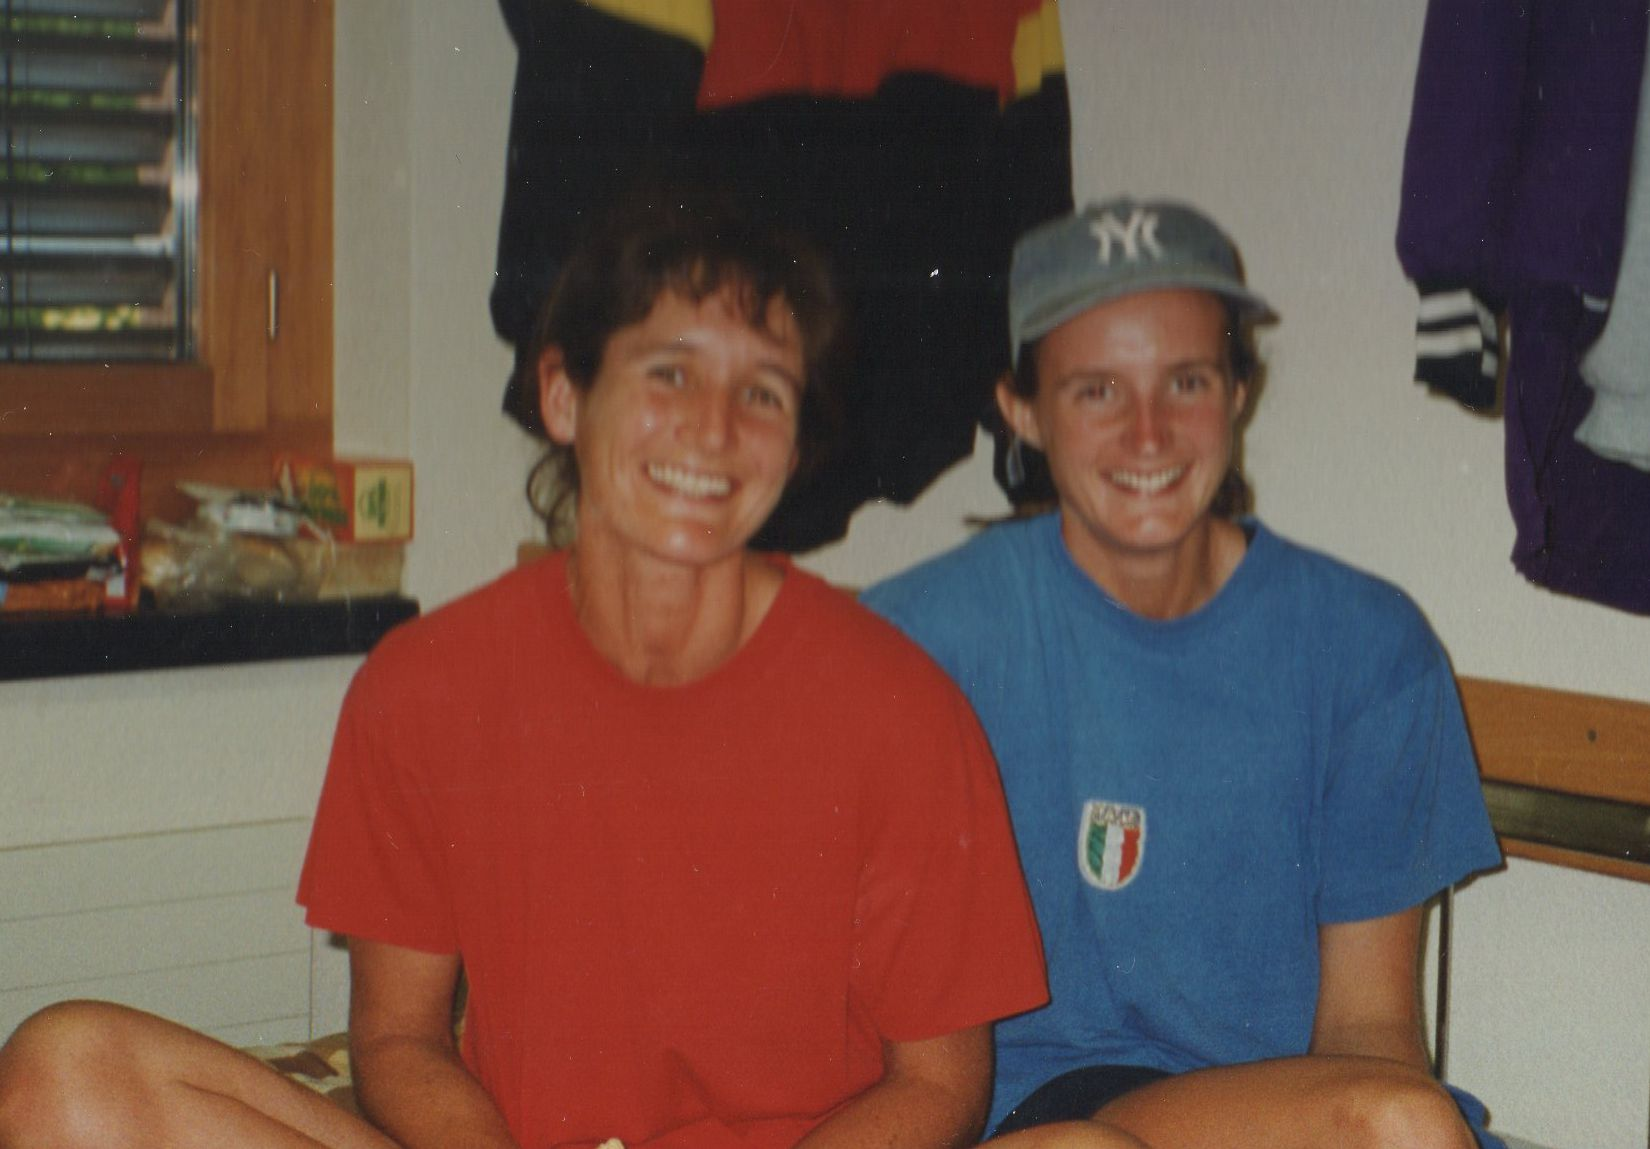 Two women in room full of rowing kit